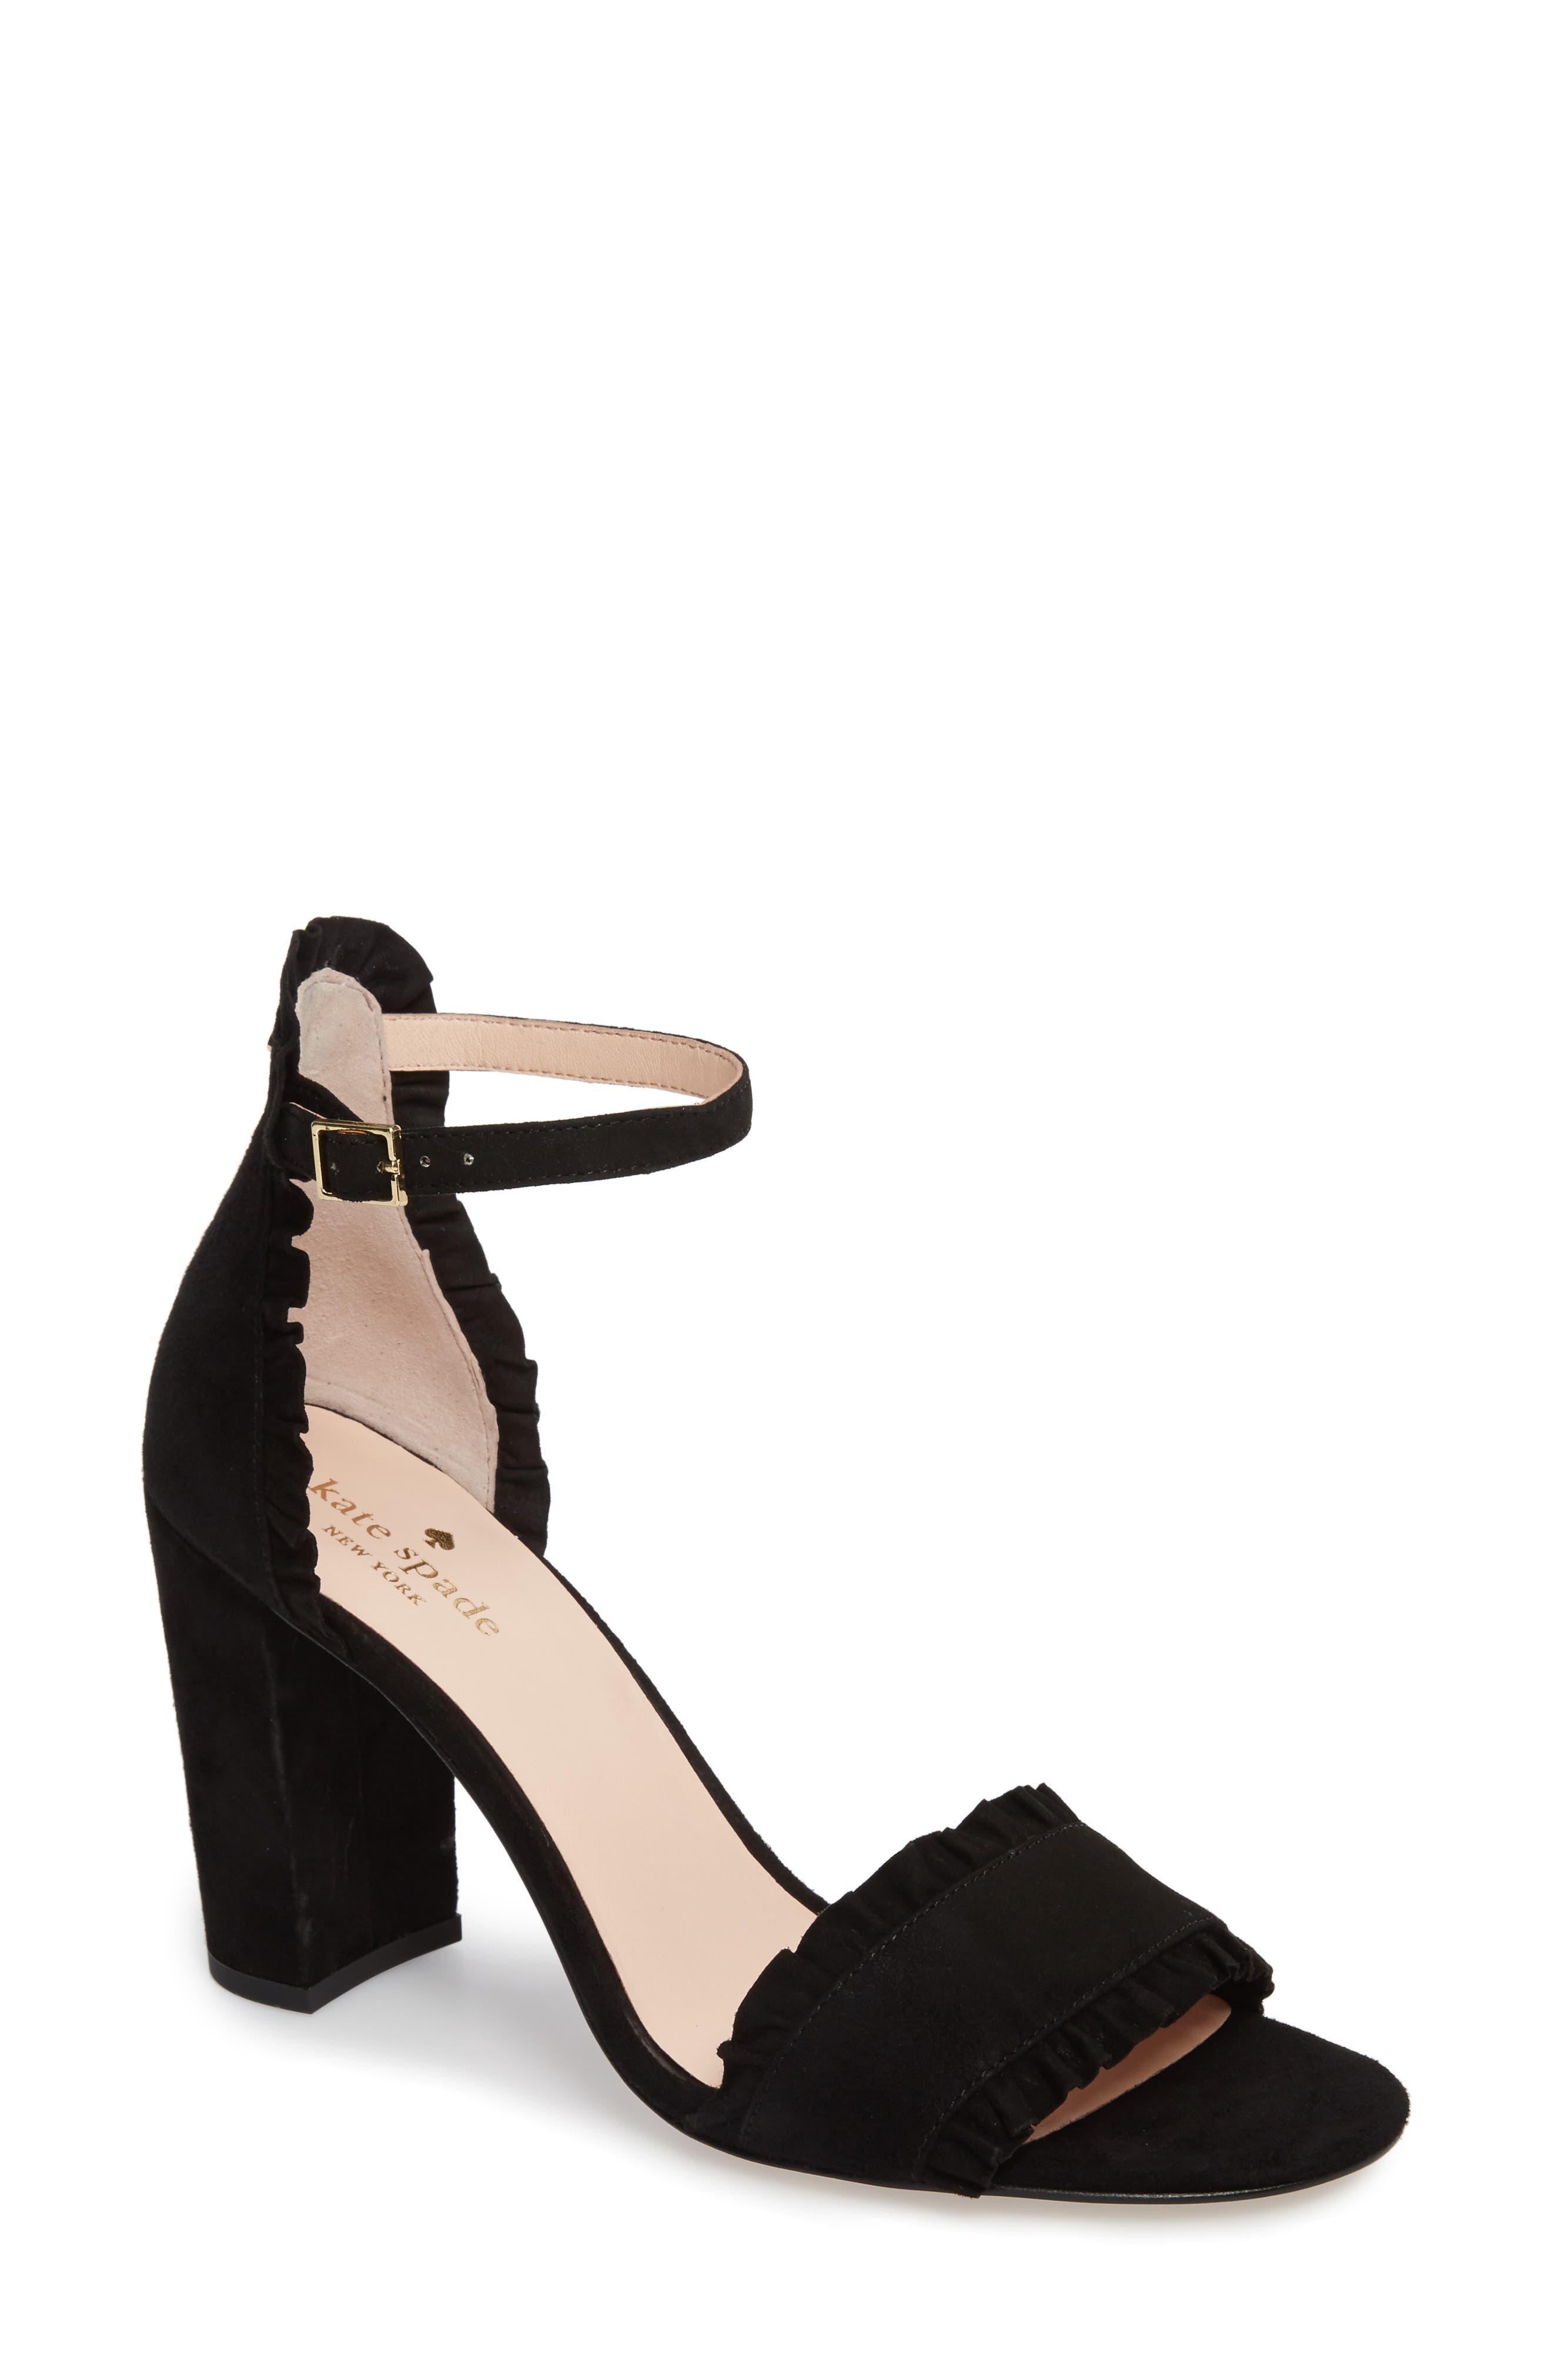 kate spade new york odele ruffle sandal (Women)